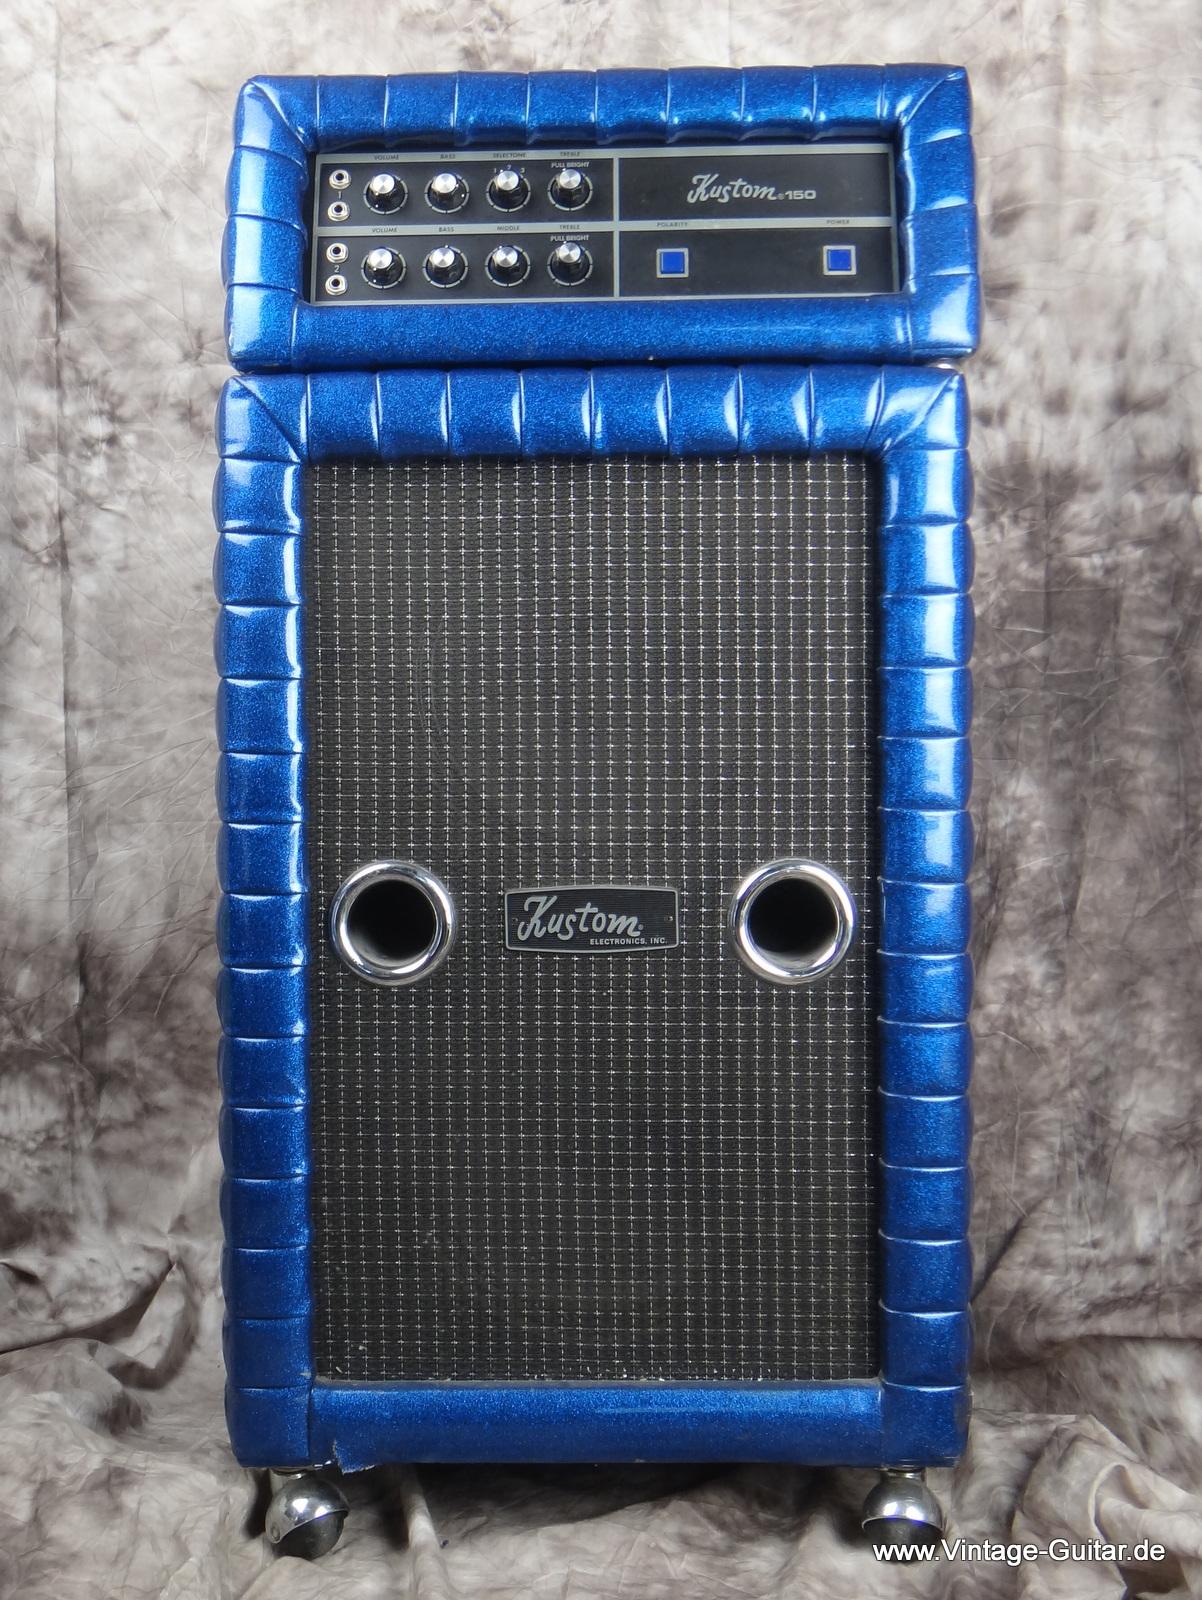 Kustom K 150 1 Top + 2 12B Cabinet 1970's Blue Sparkle Amp For ...